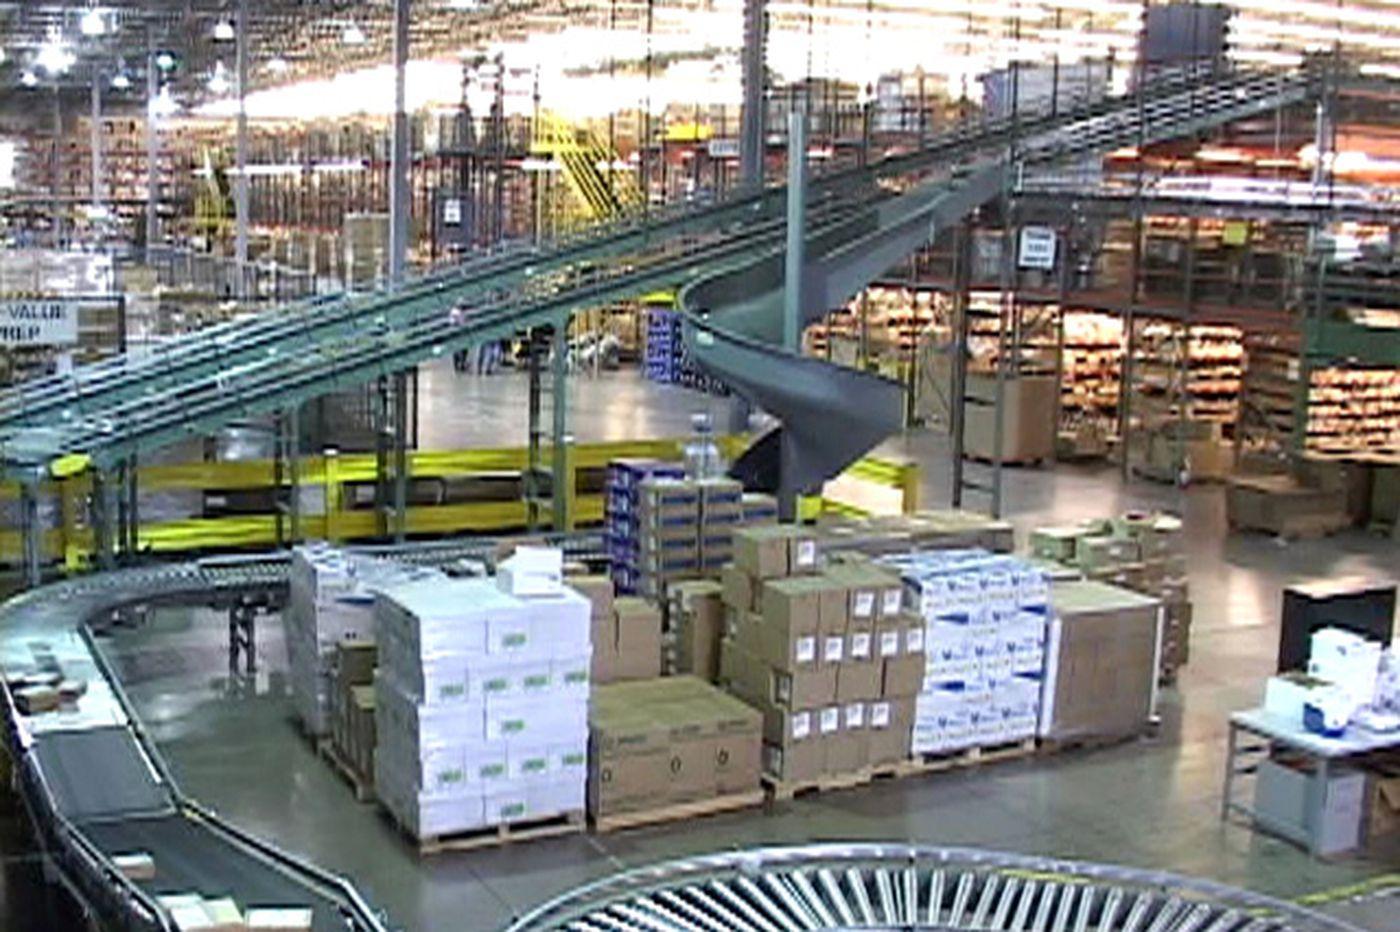 eCommerce giant Radial to hire 2,000 seasonal workers in the Philadelphia region